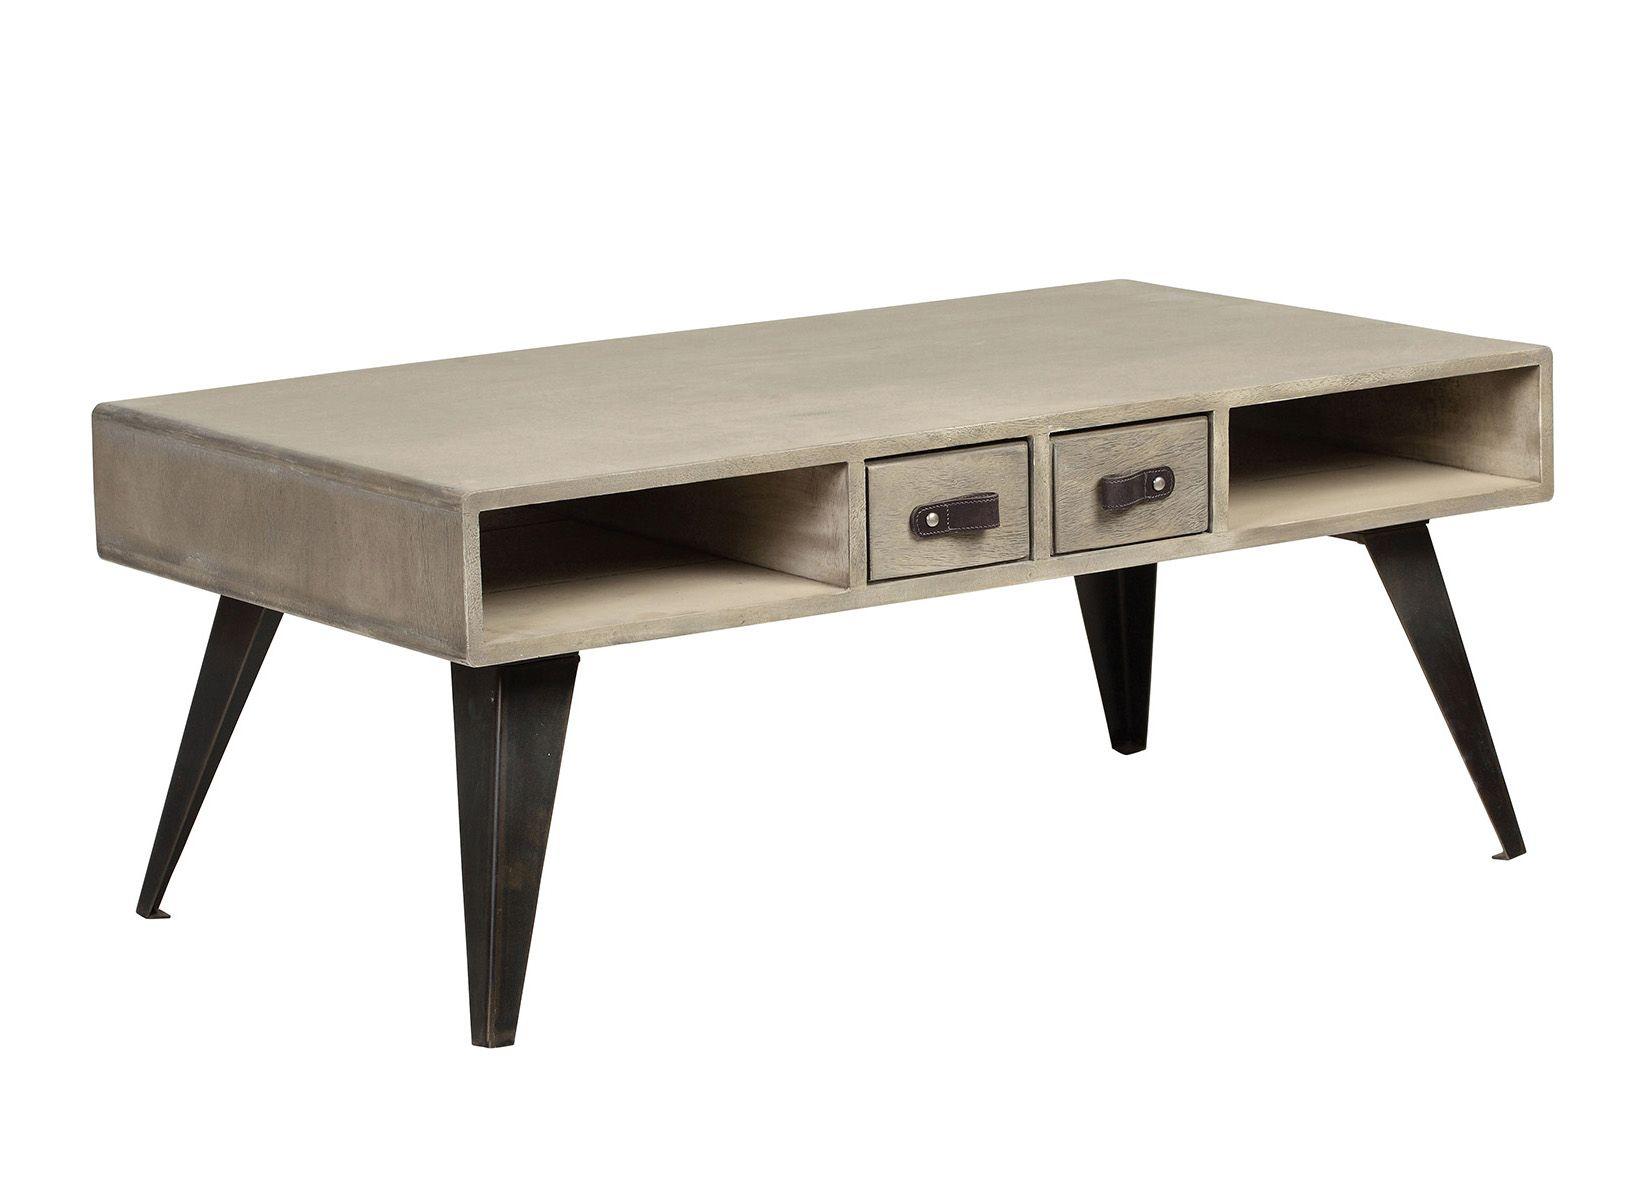 Table Basse En Manguier Massif 2 Tiroirs 2 Niches Pieds Metal 99